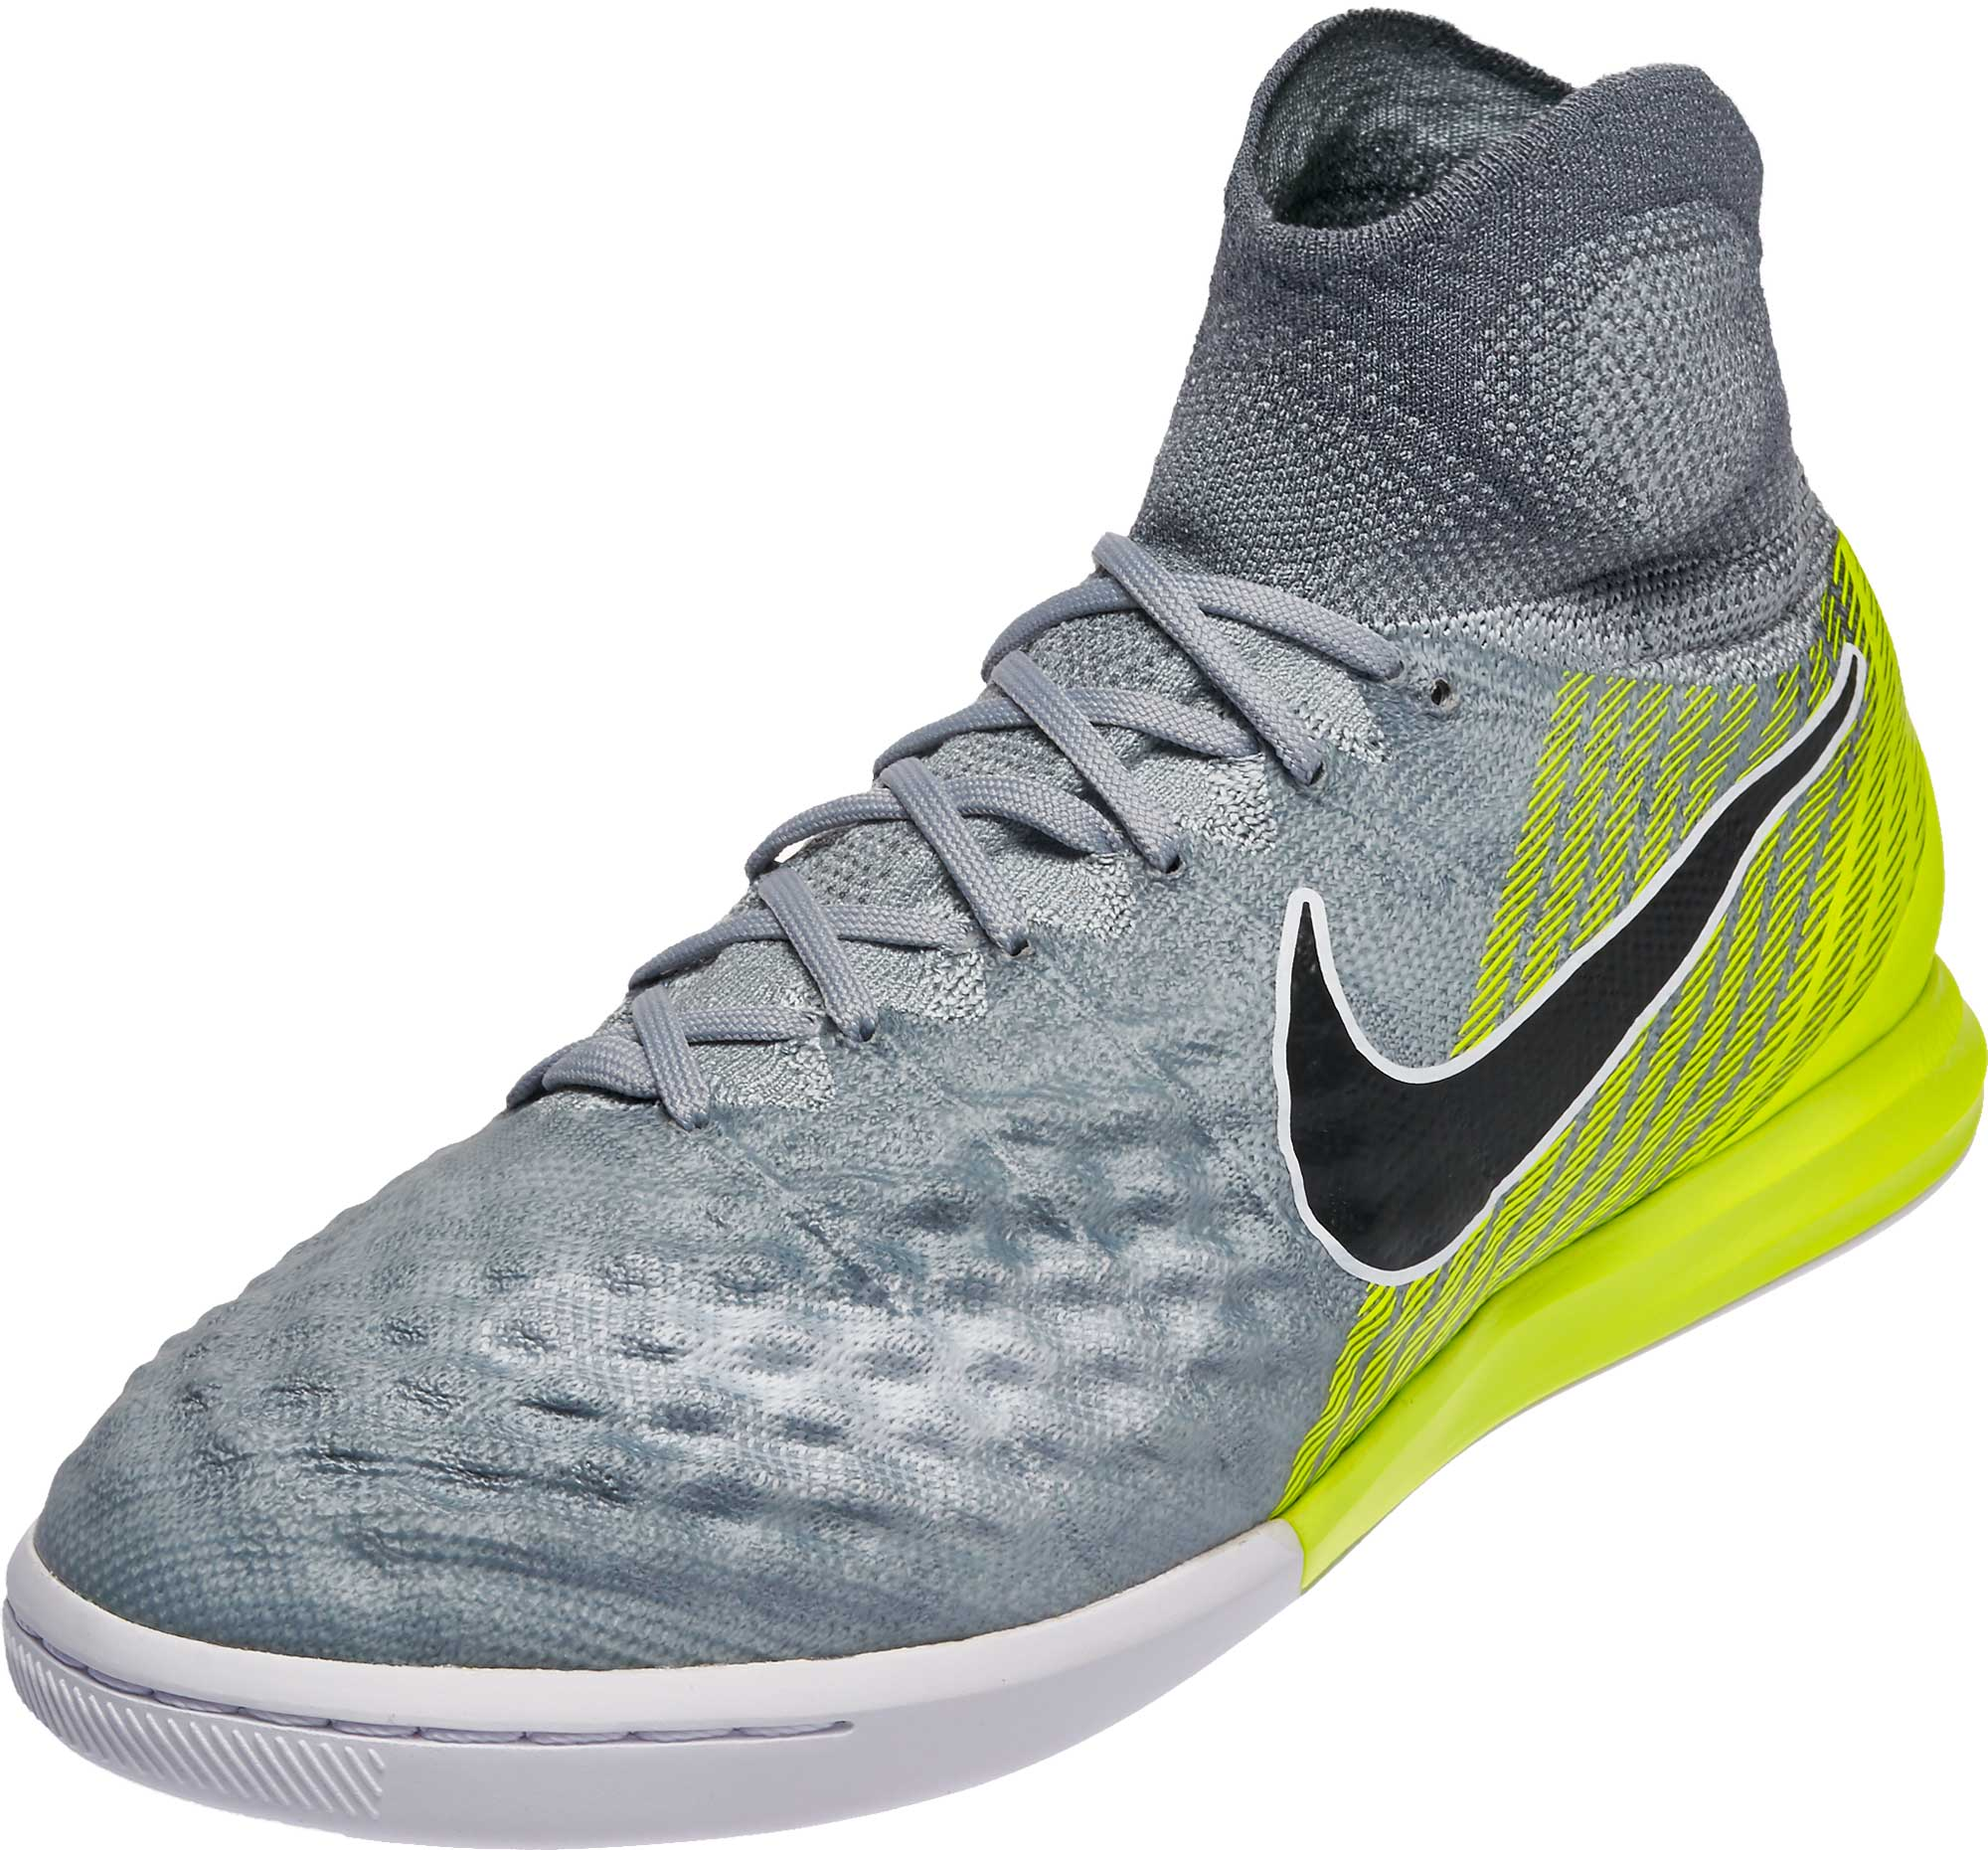 Nike MagistaX Proximo II IC - Grey